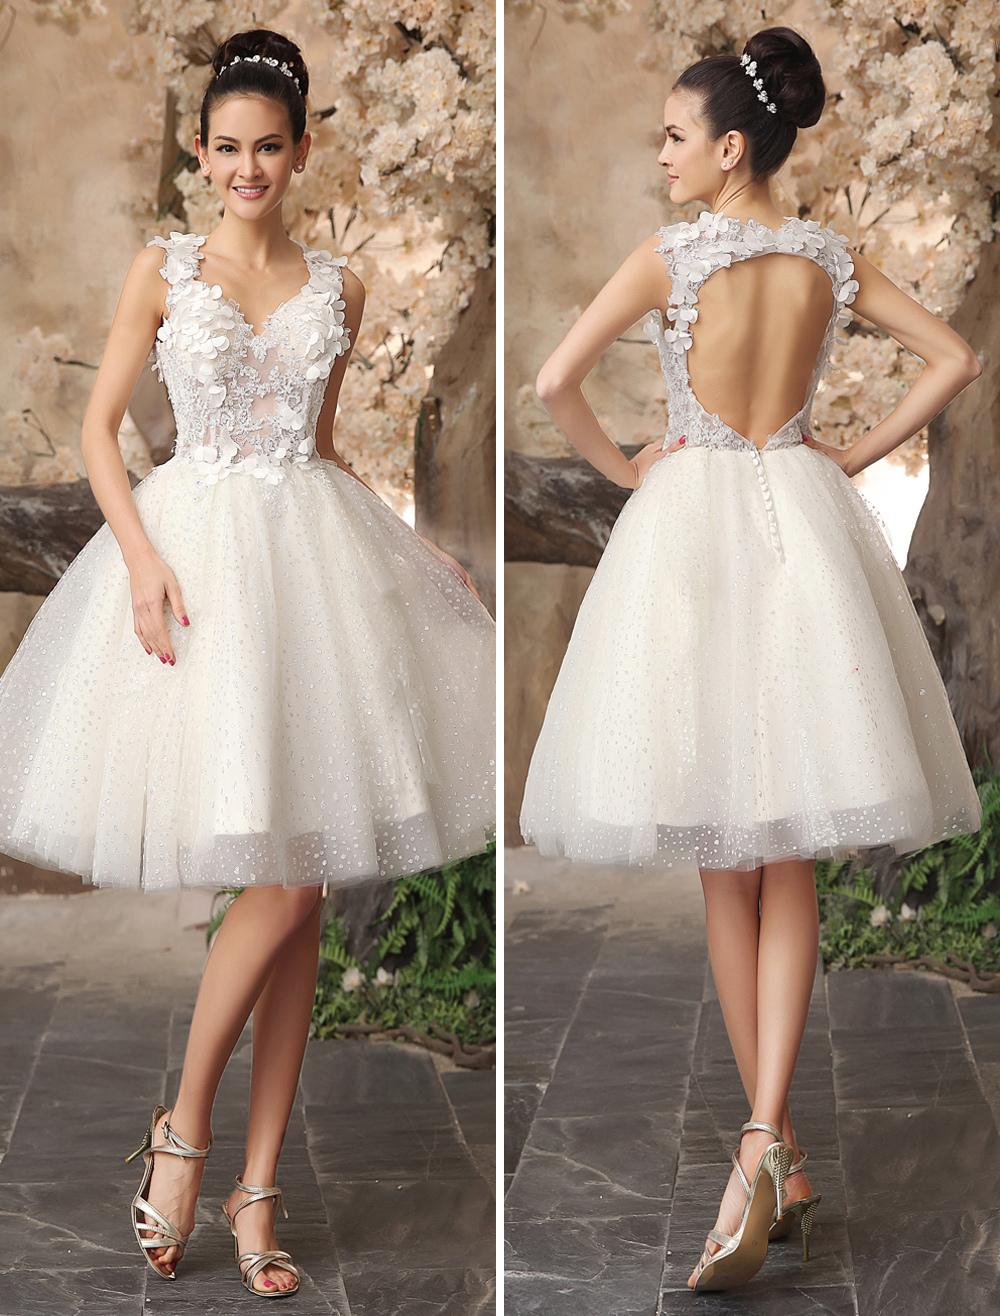 ivory backless lace applique tulle sequins wedding dress milanoo. Black Bedroom Furniture Sets. Home Design Ideas